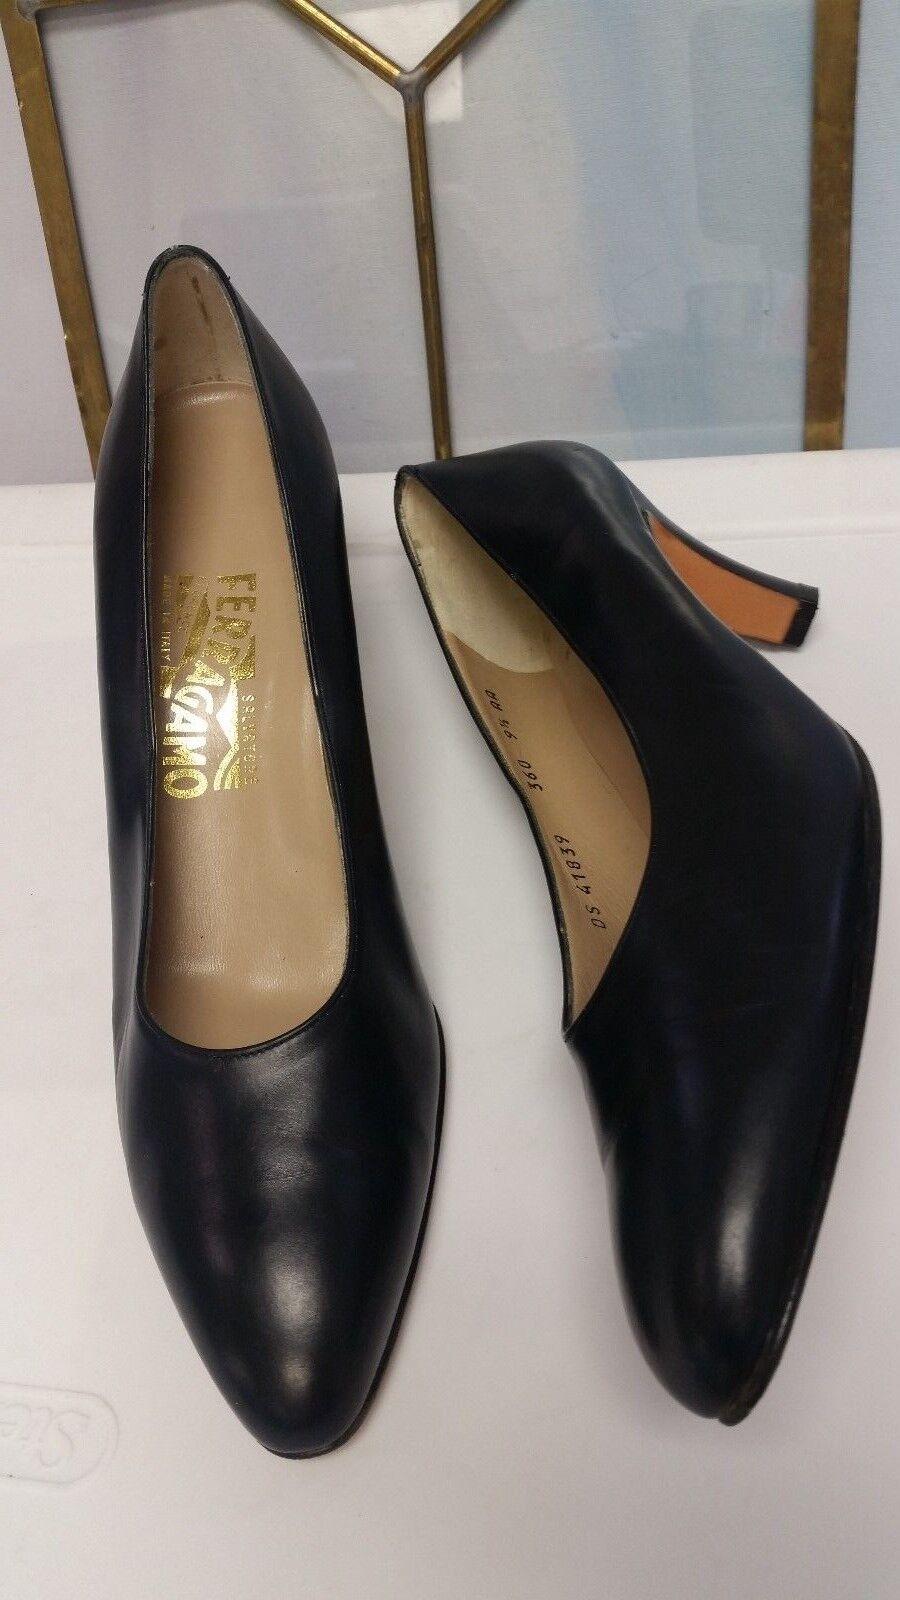 Womens Salvatore Ferragamo bluee Leather Closed Toe Pumps High Heels Size 9.5 AA